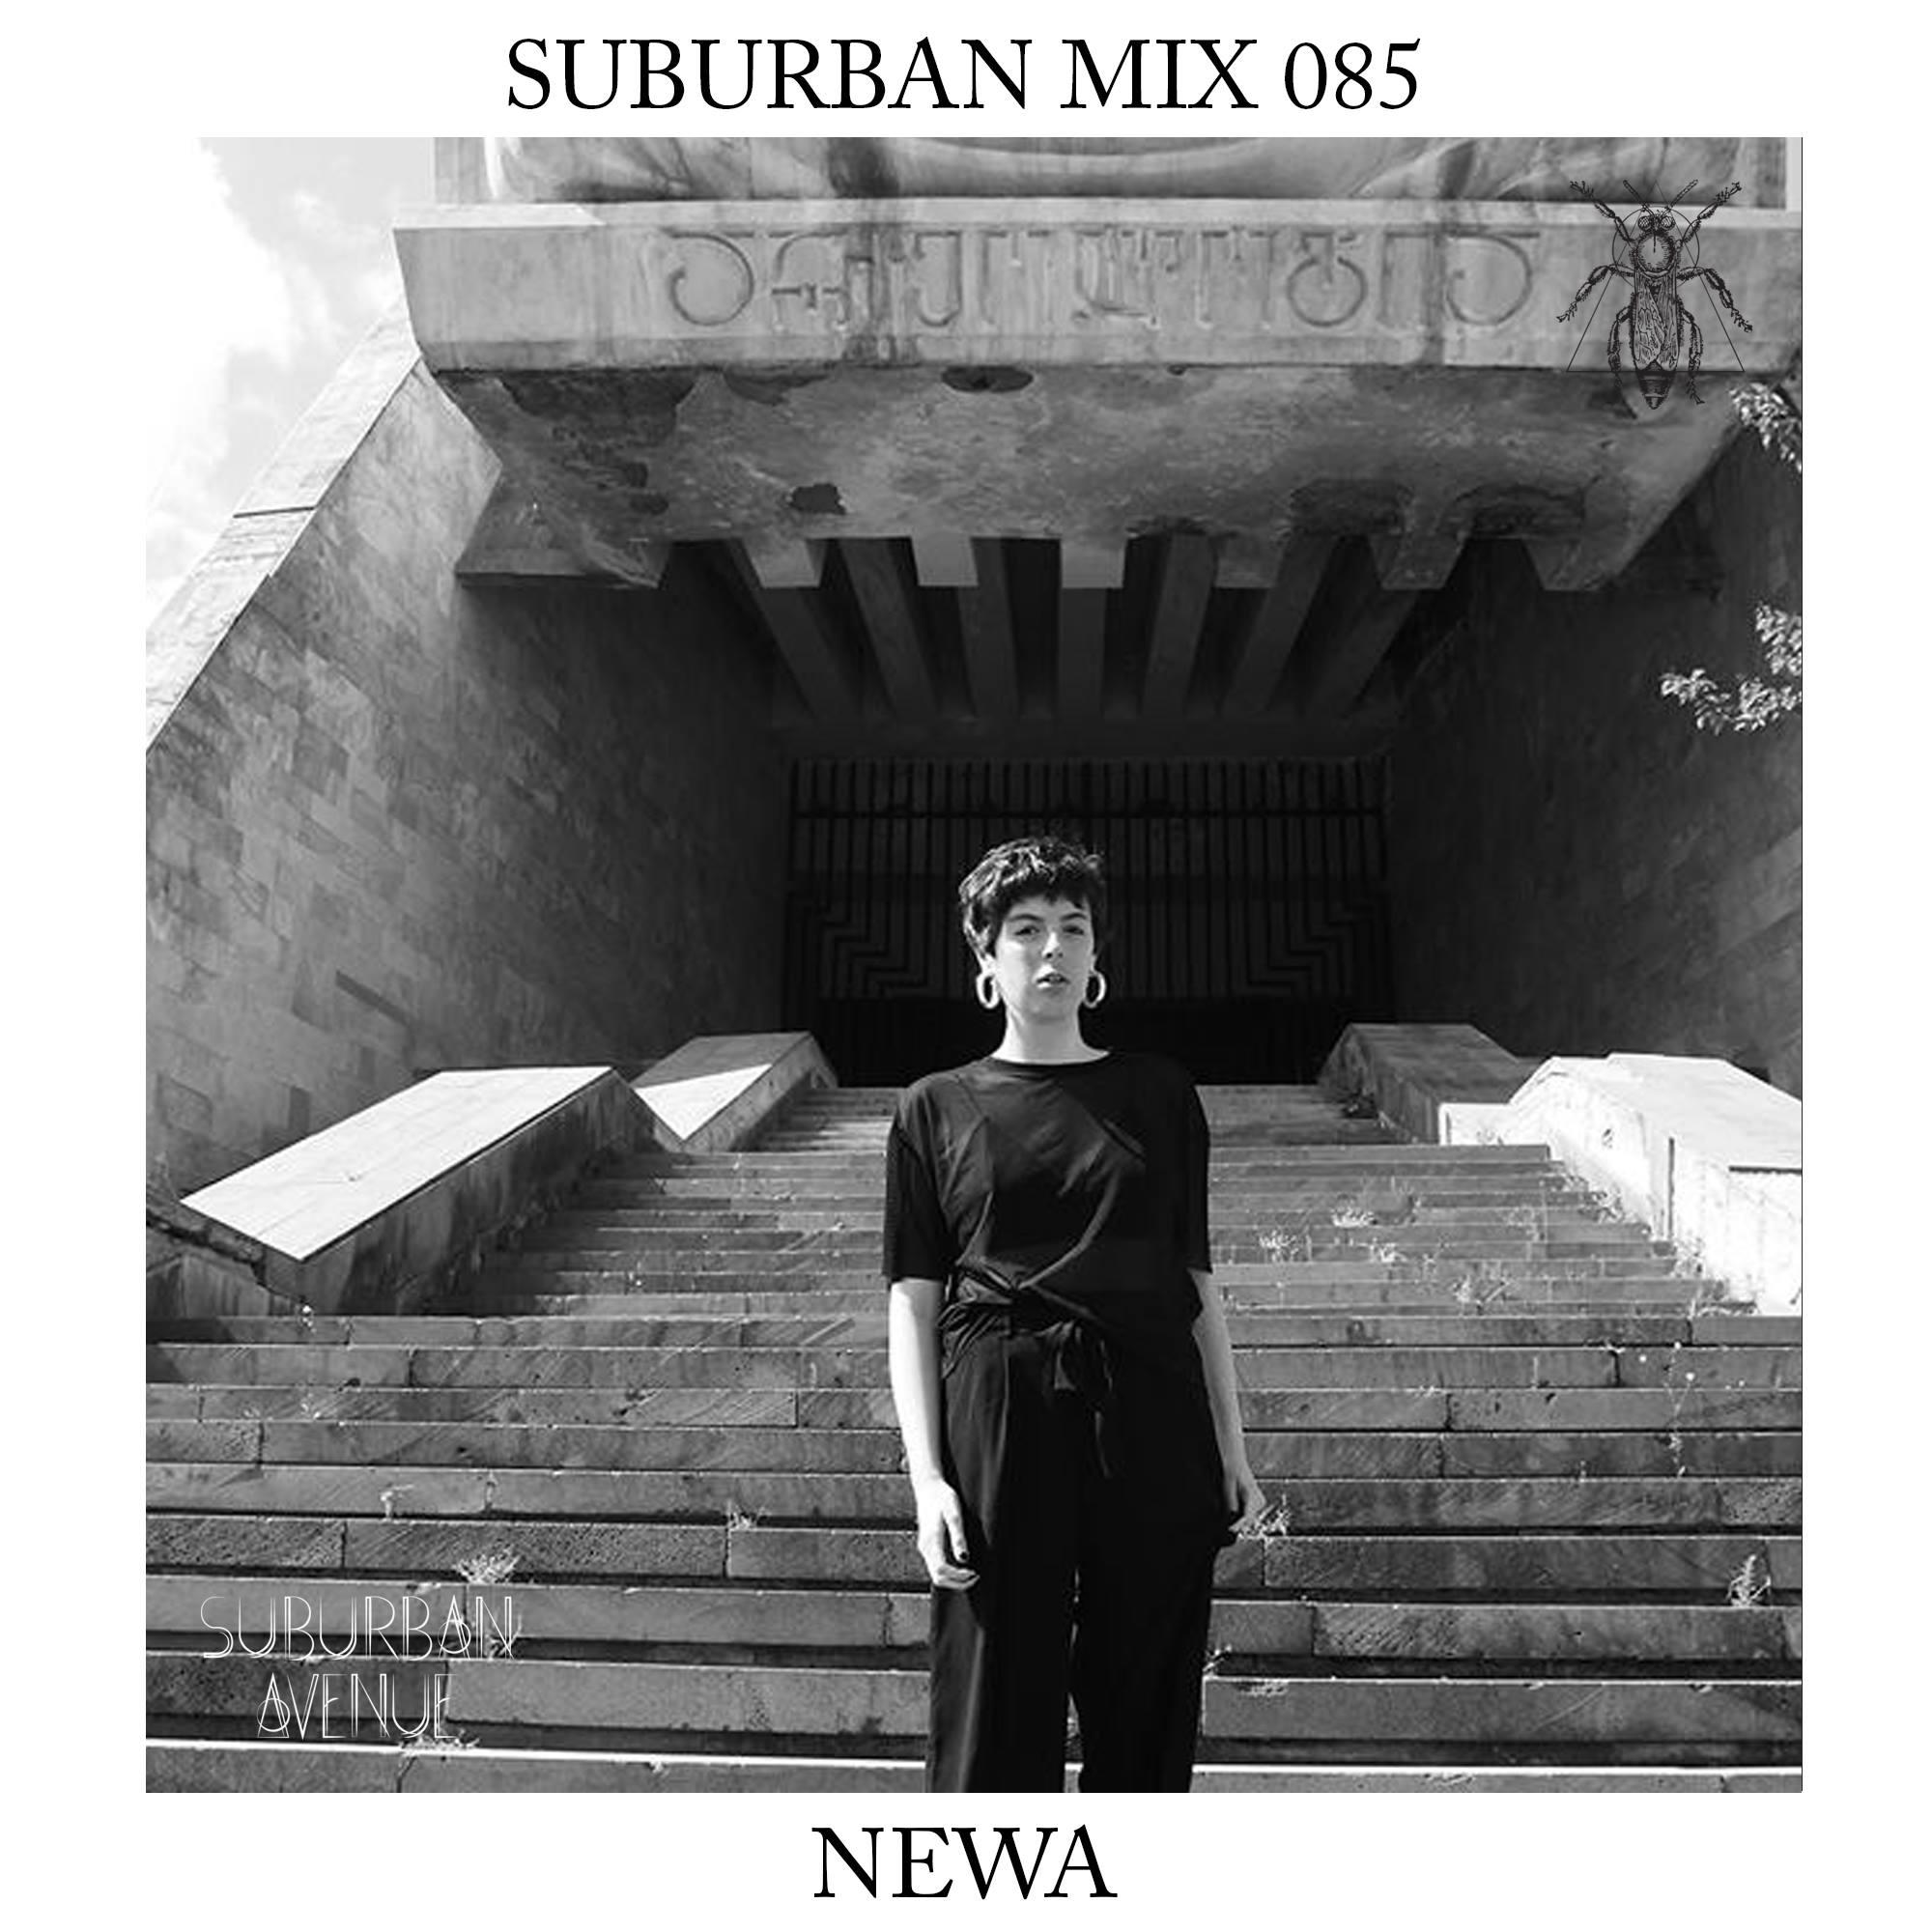 Suburban Mix 085 - Newa